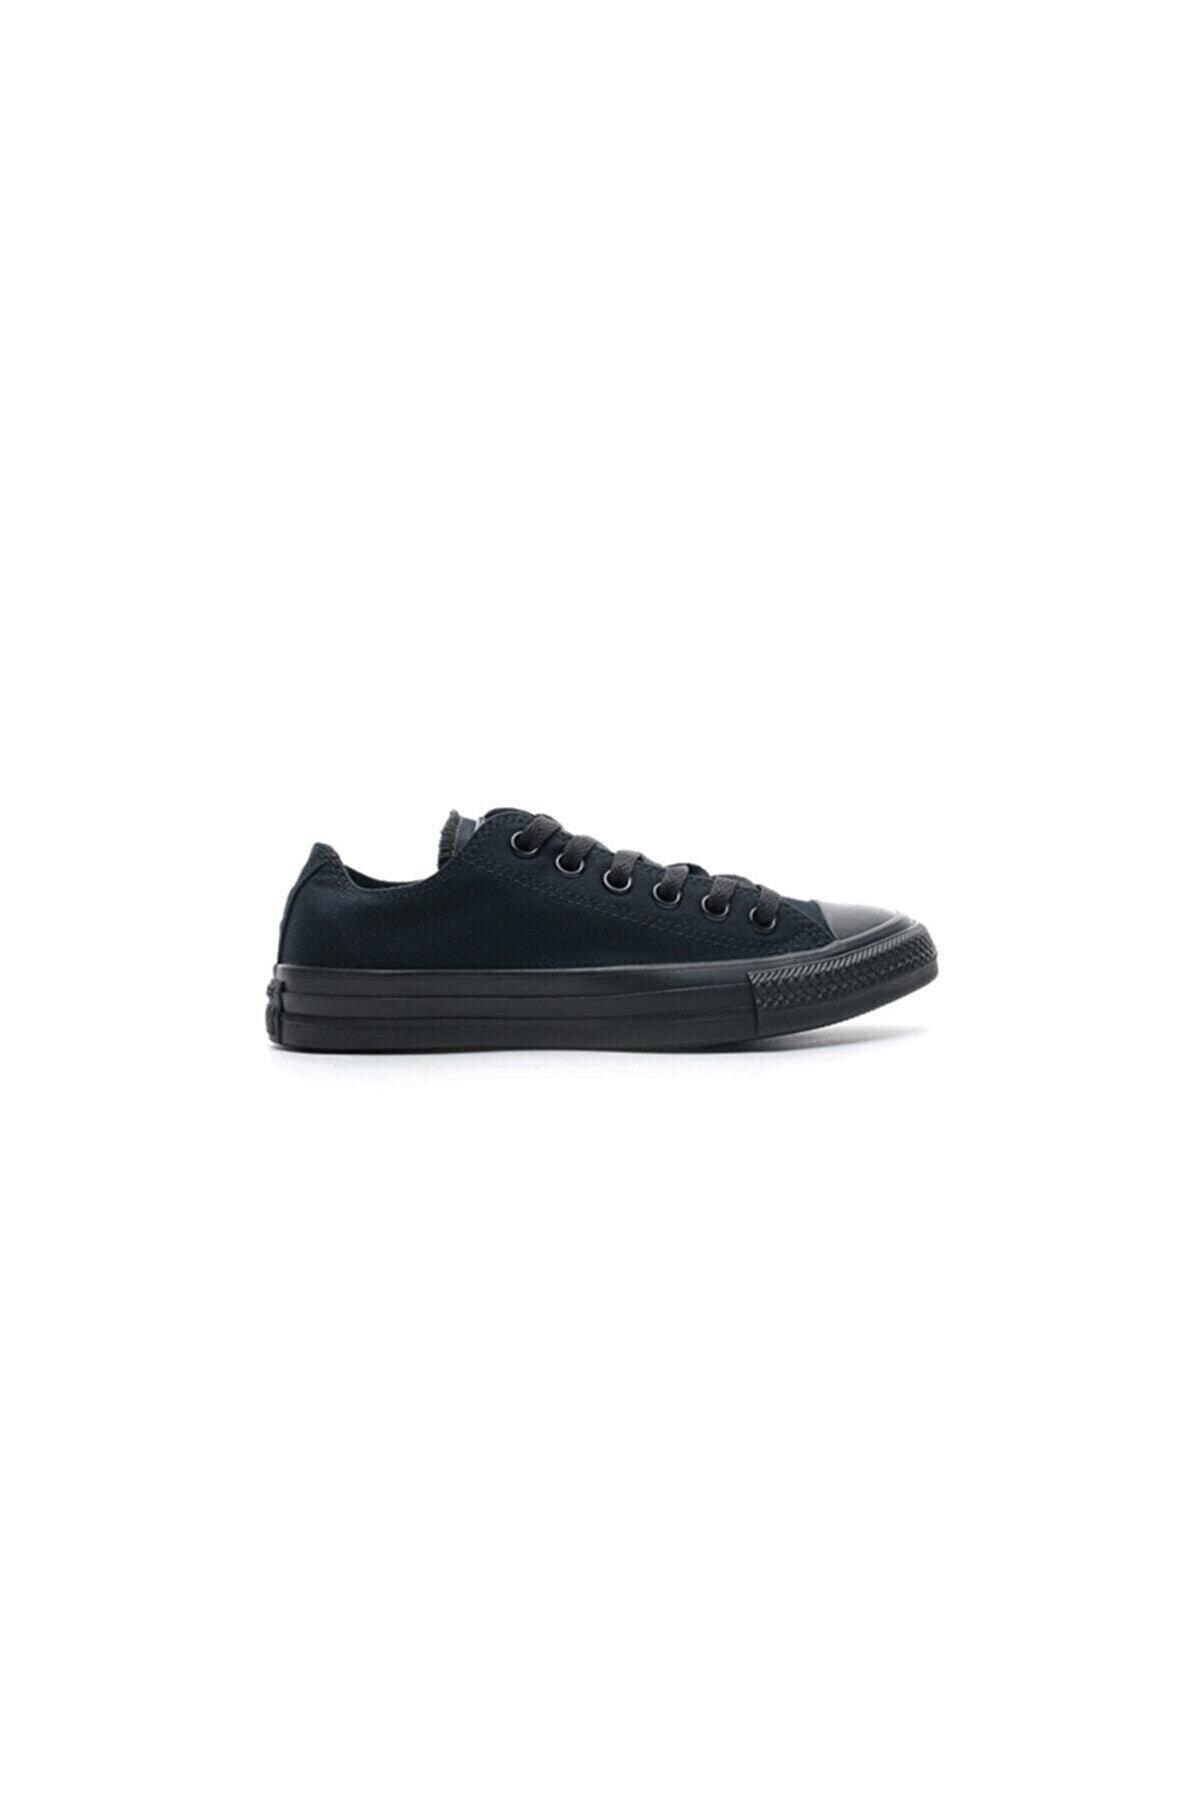 Converse Kadın Sneaker - Chuck Taylor All Star M5039 - M5039C